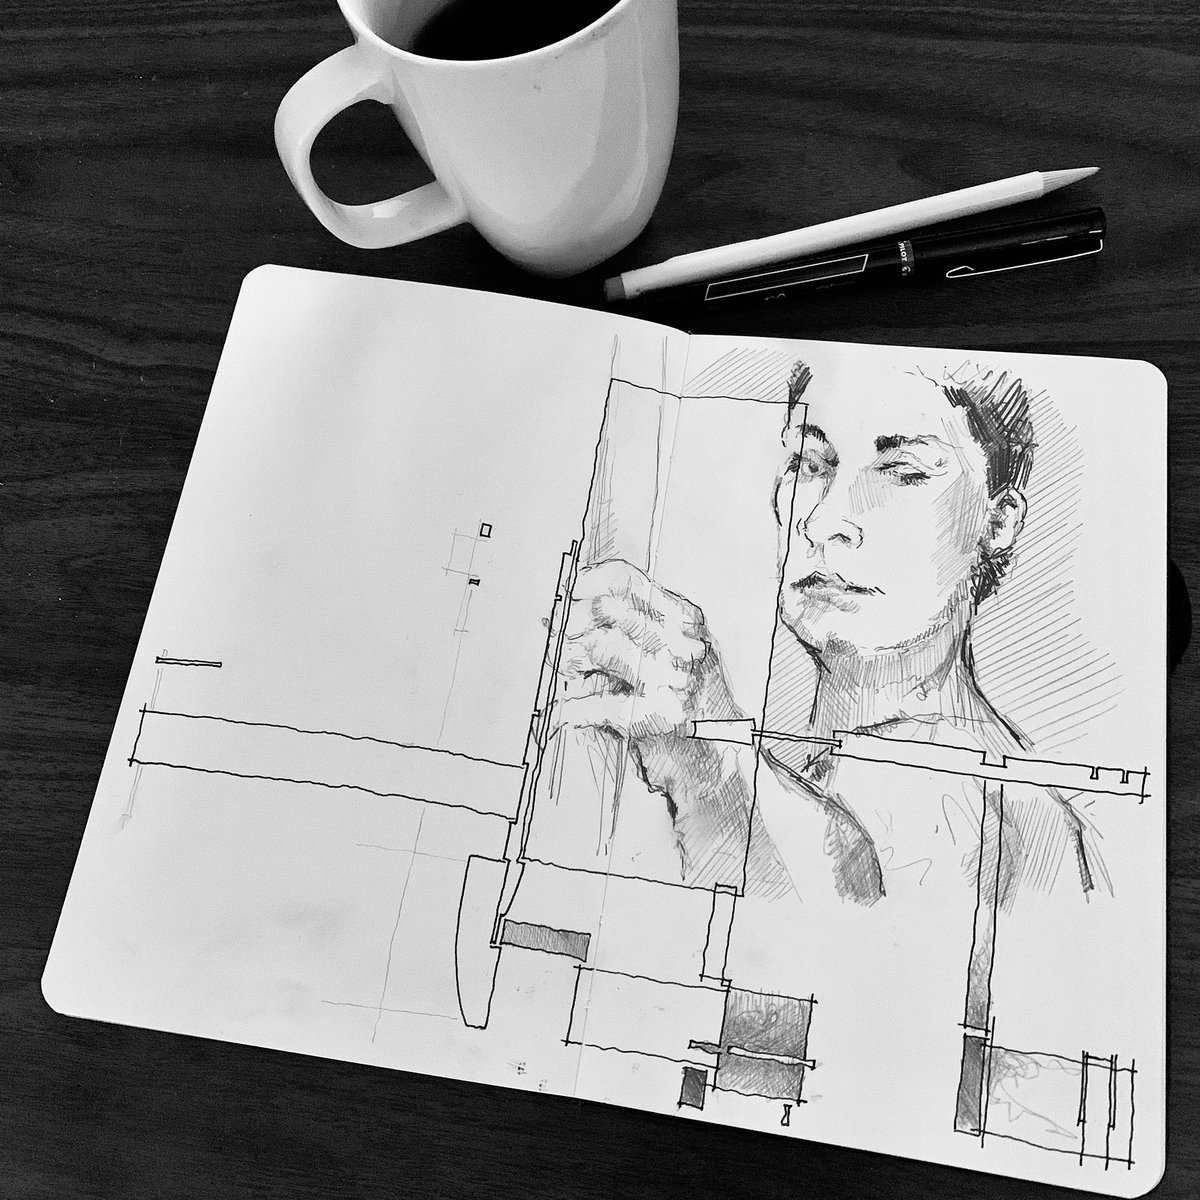 07.06.20  #coffeesketch #pencilsketch #inksketch #mixedmedia #figure #figuredrawing  #formspaceorder #hybriddrawing #draweveryday #dailysketch #quicksketch #art #architecture #podcastpic.twitter.com/avUUUkua5X